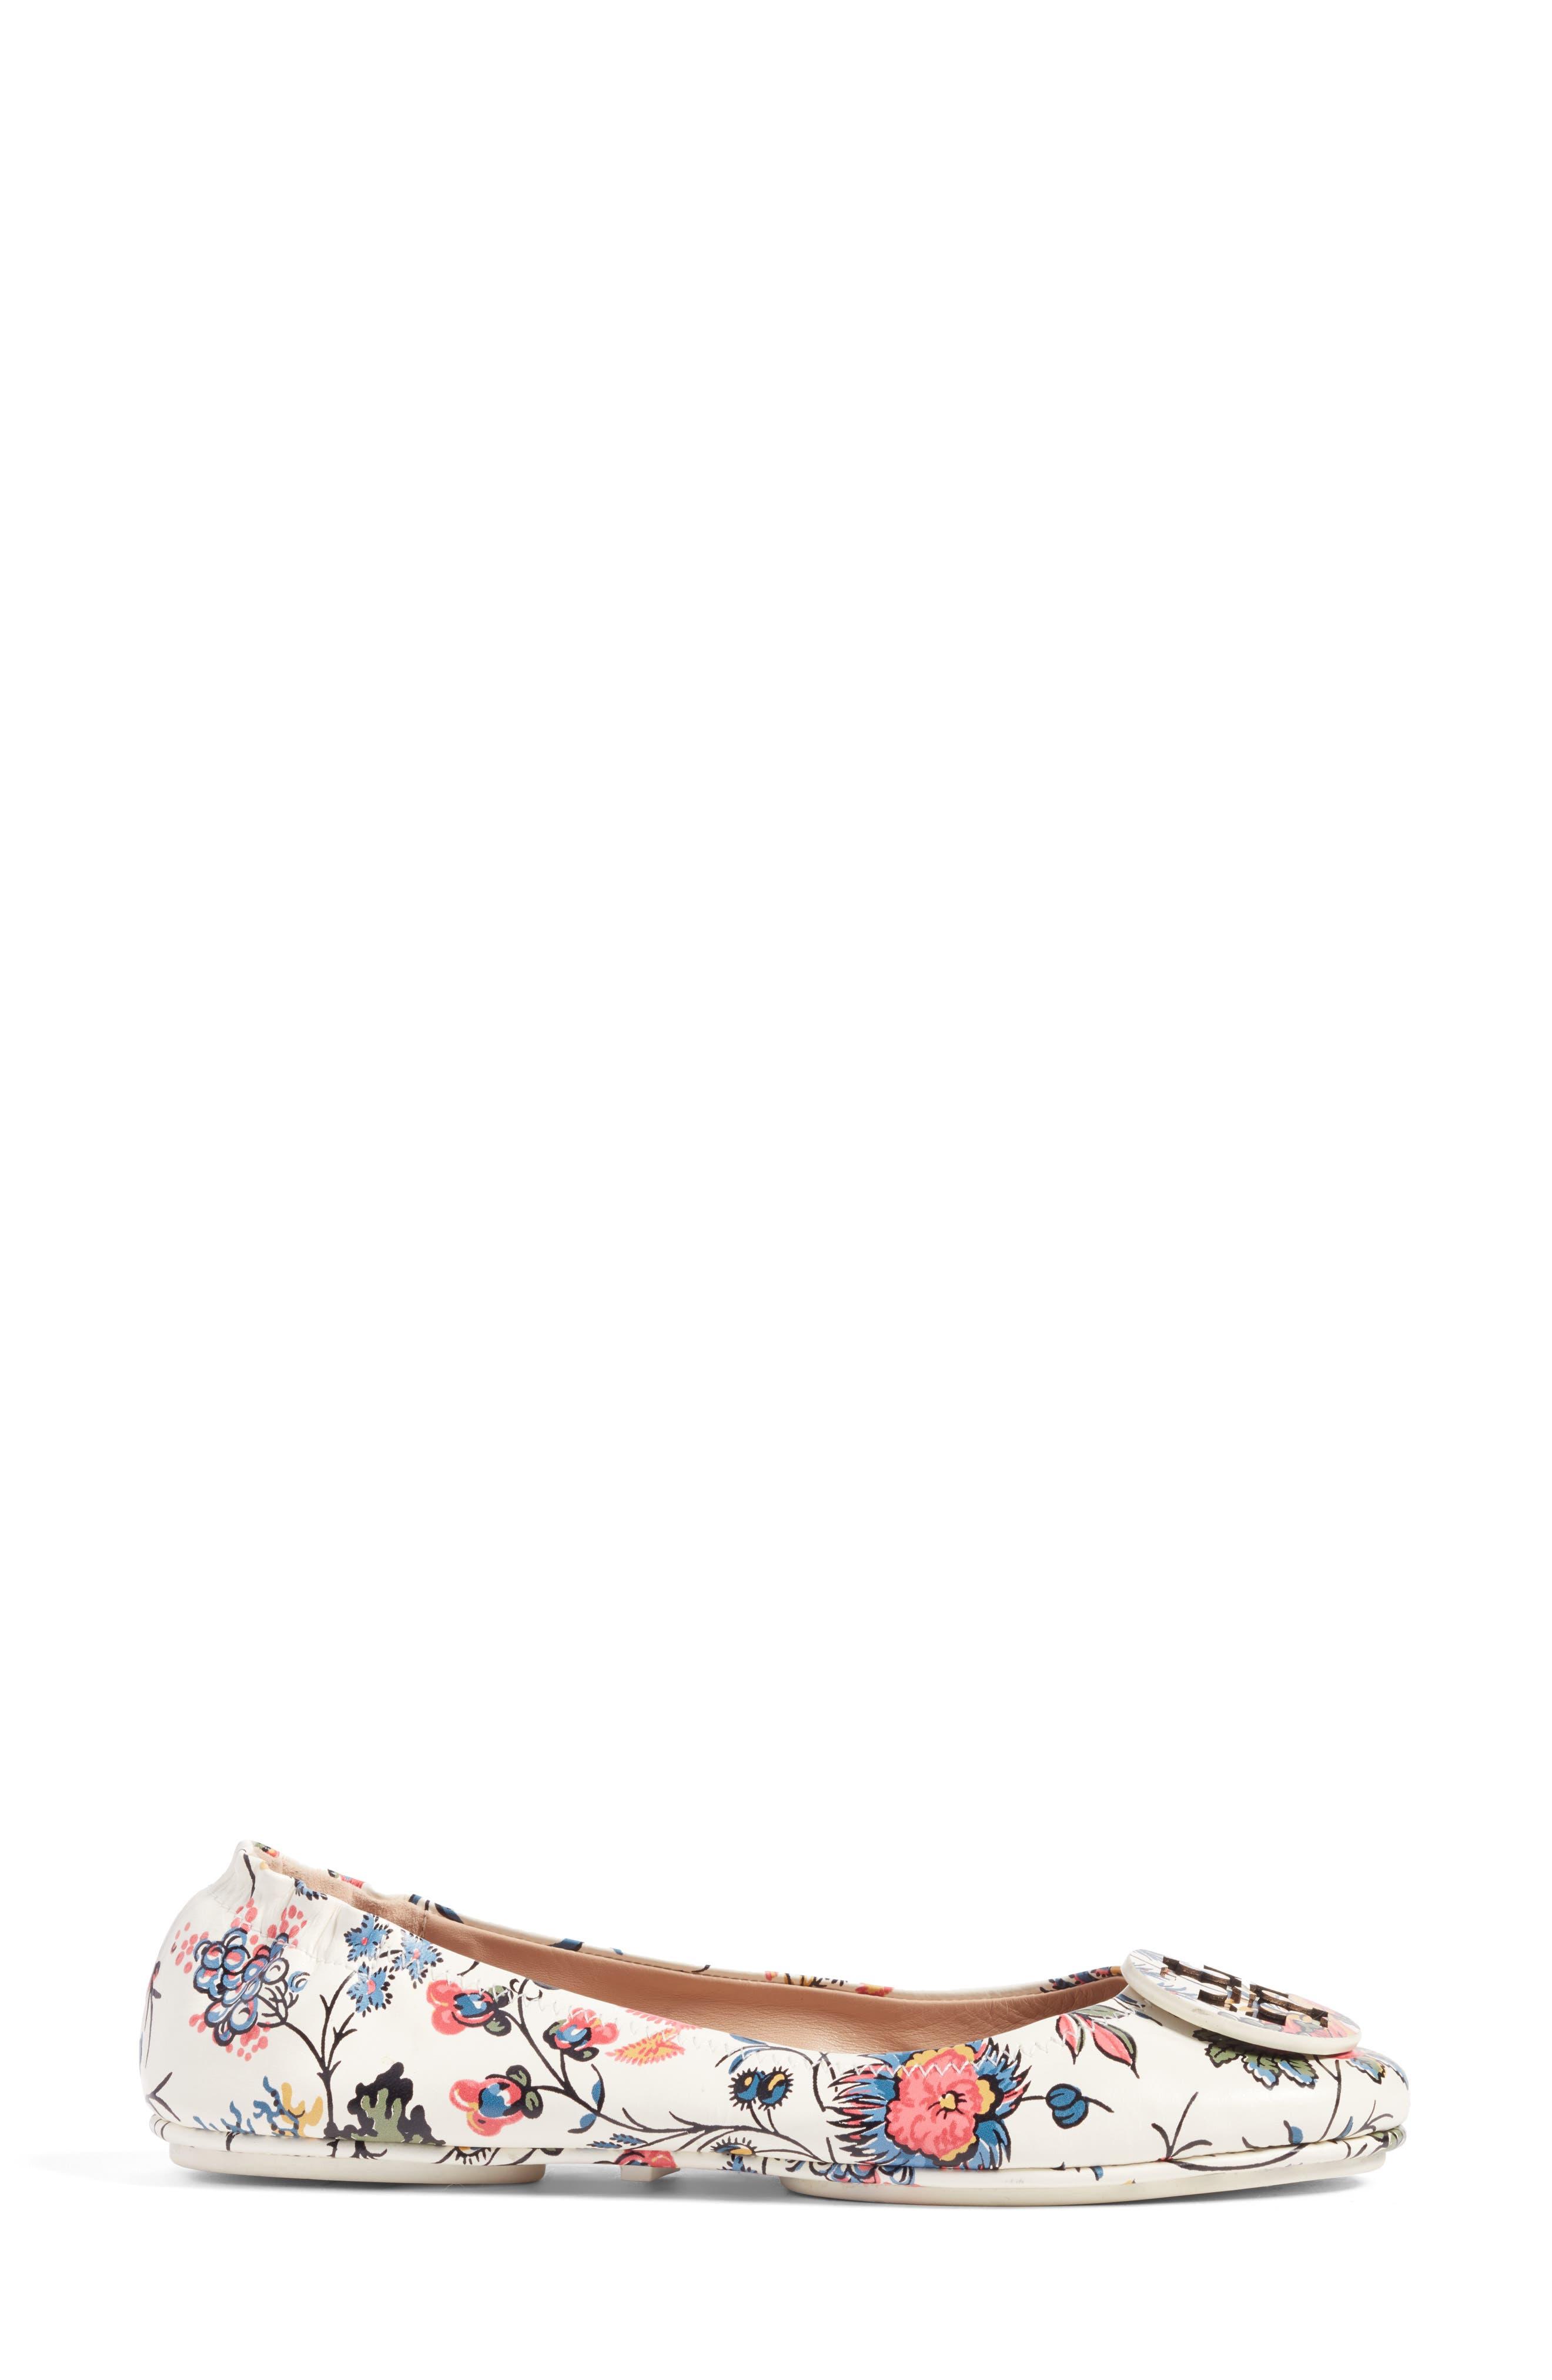 'Minnie' Travel Ballet Flat,                             Alternate thumbnail 154, color,